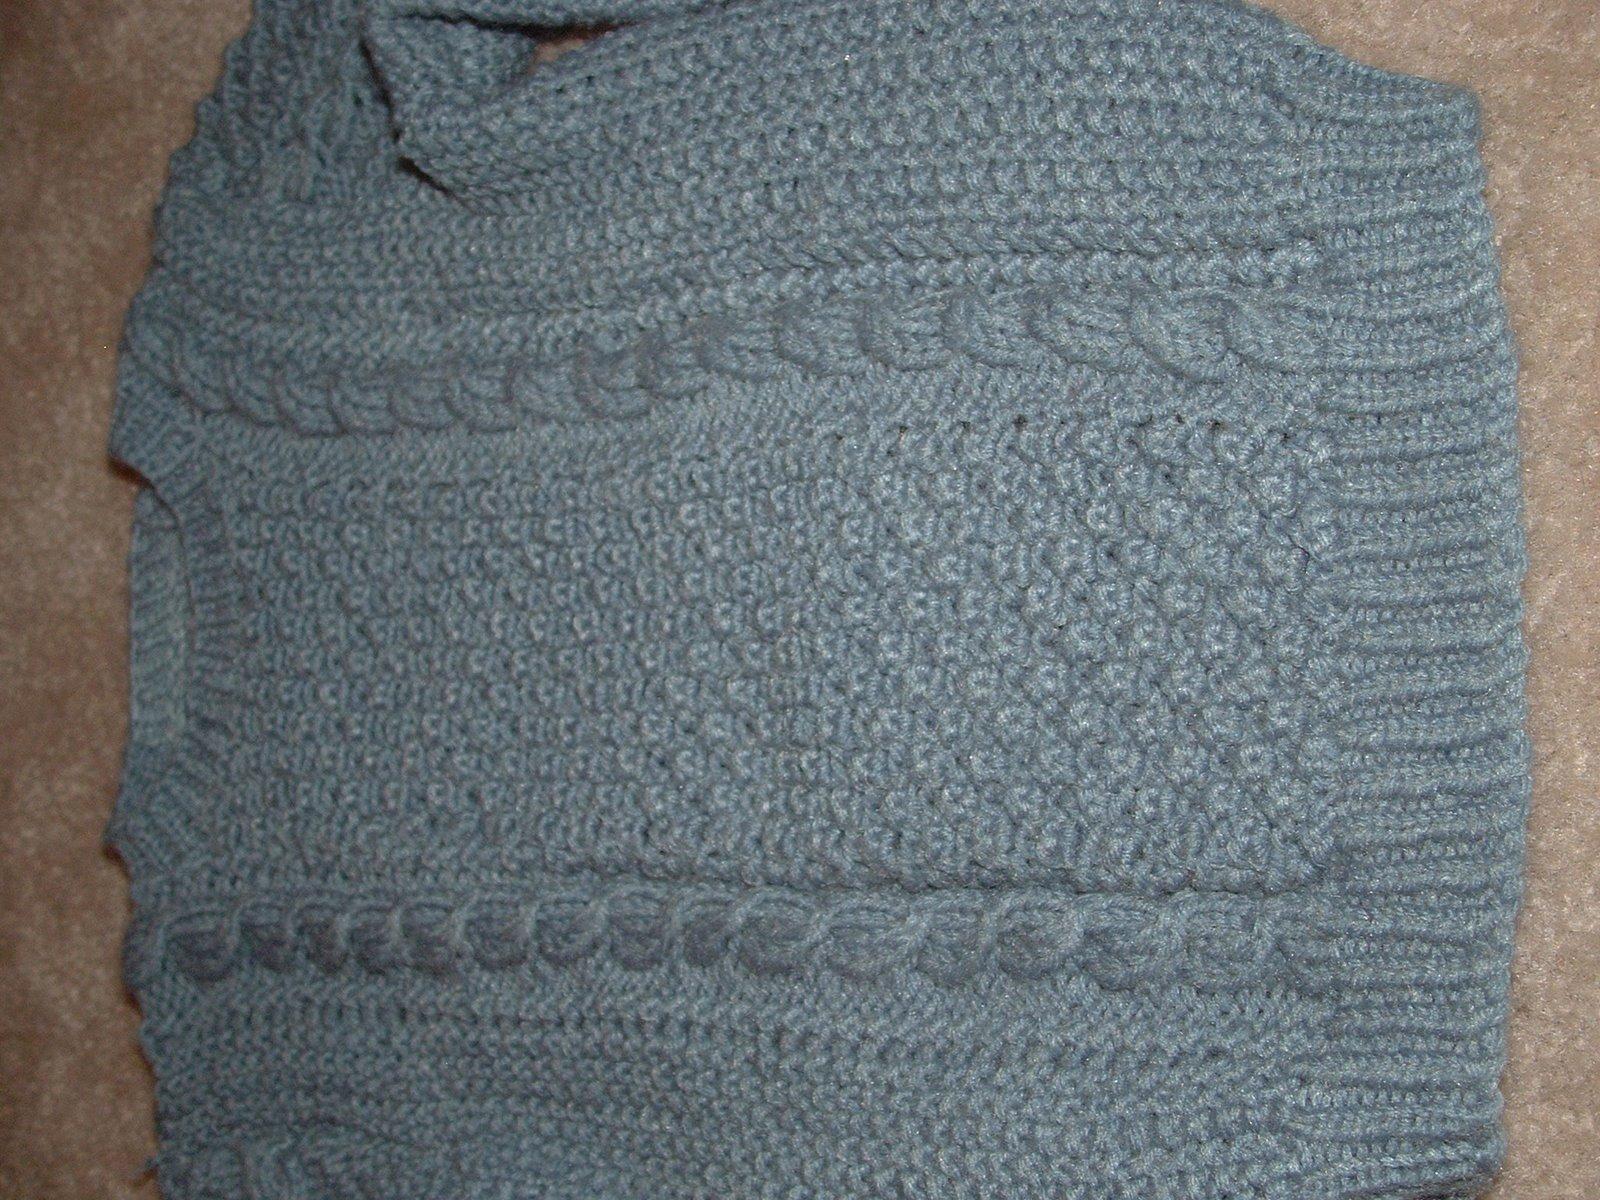 [Deidre+sweater+2]